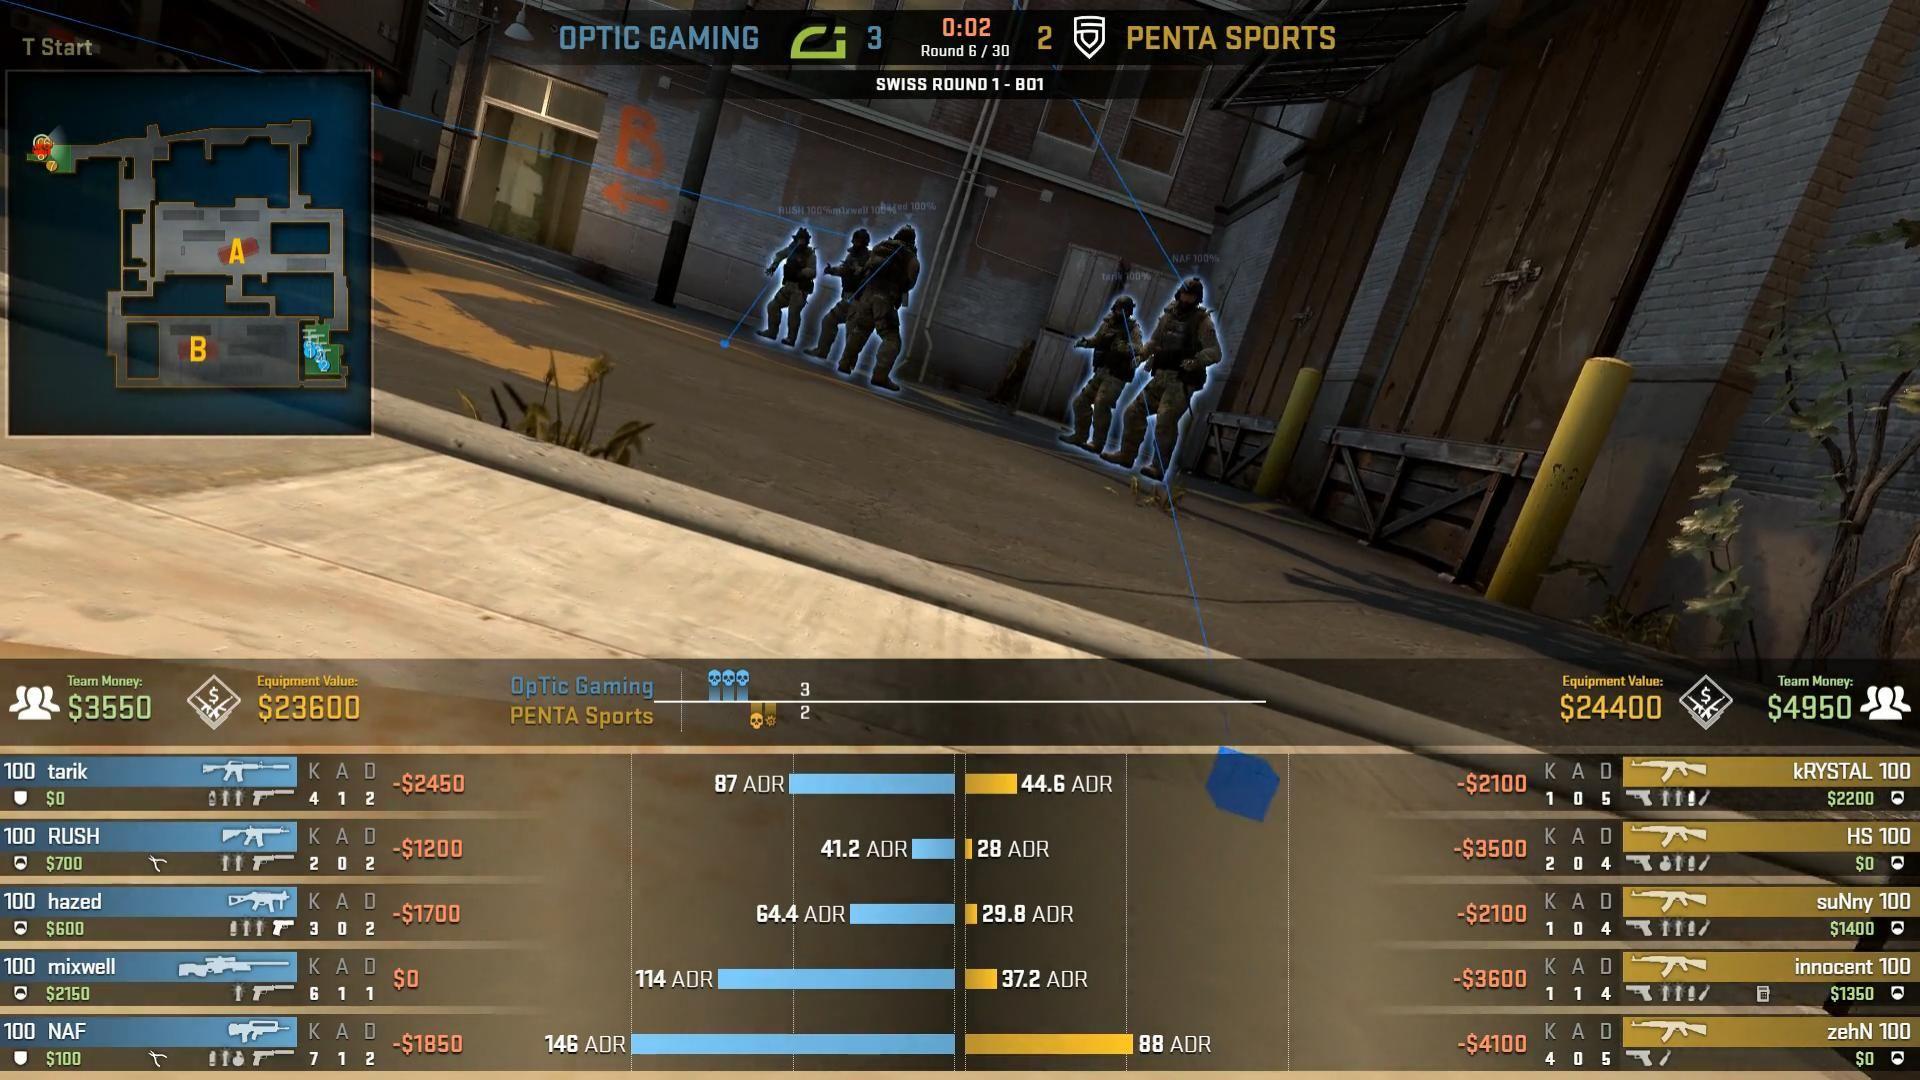 CS ga matchmaking stats